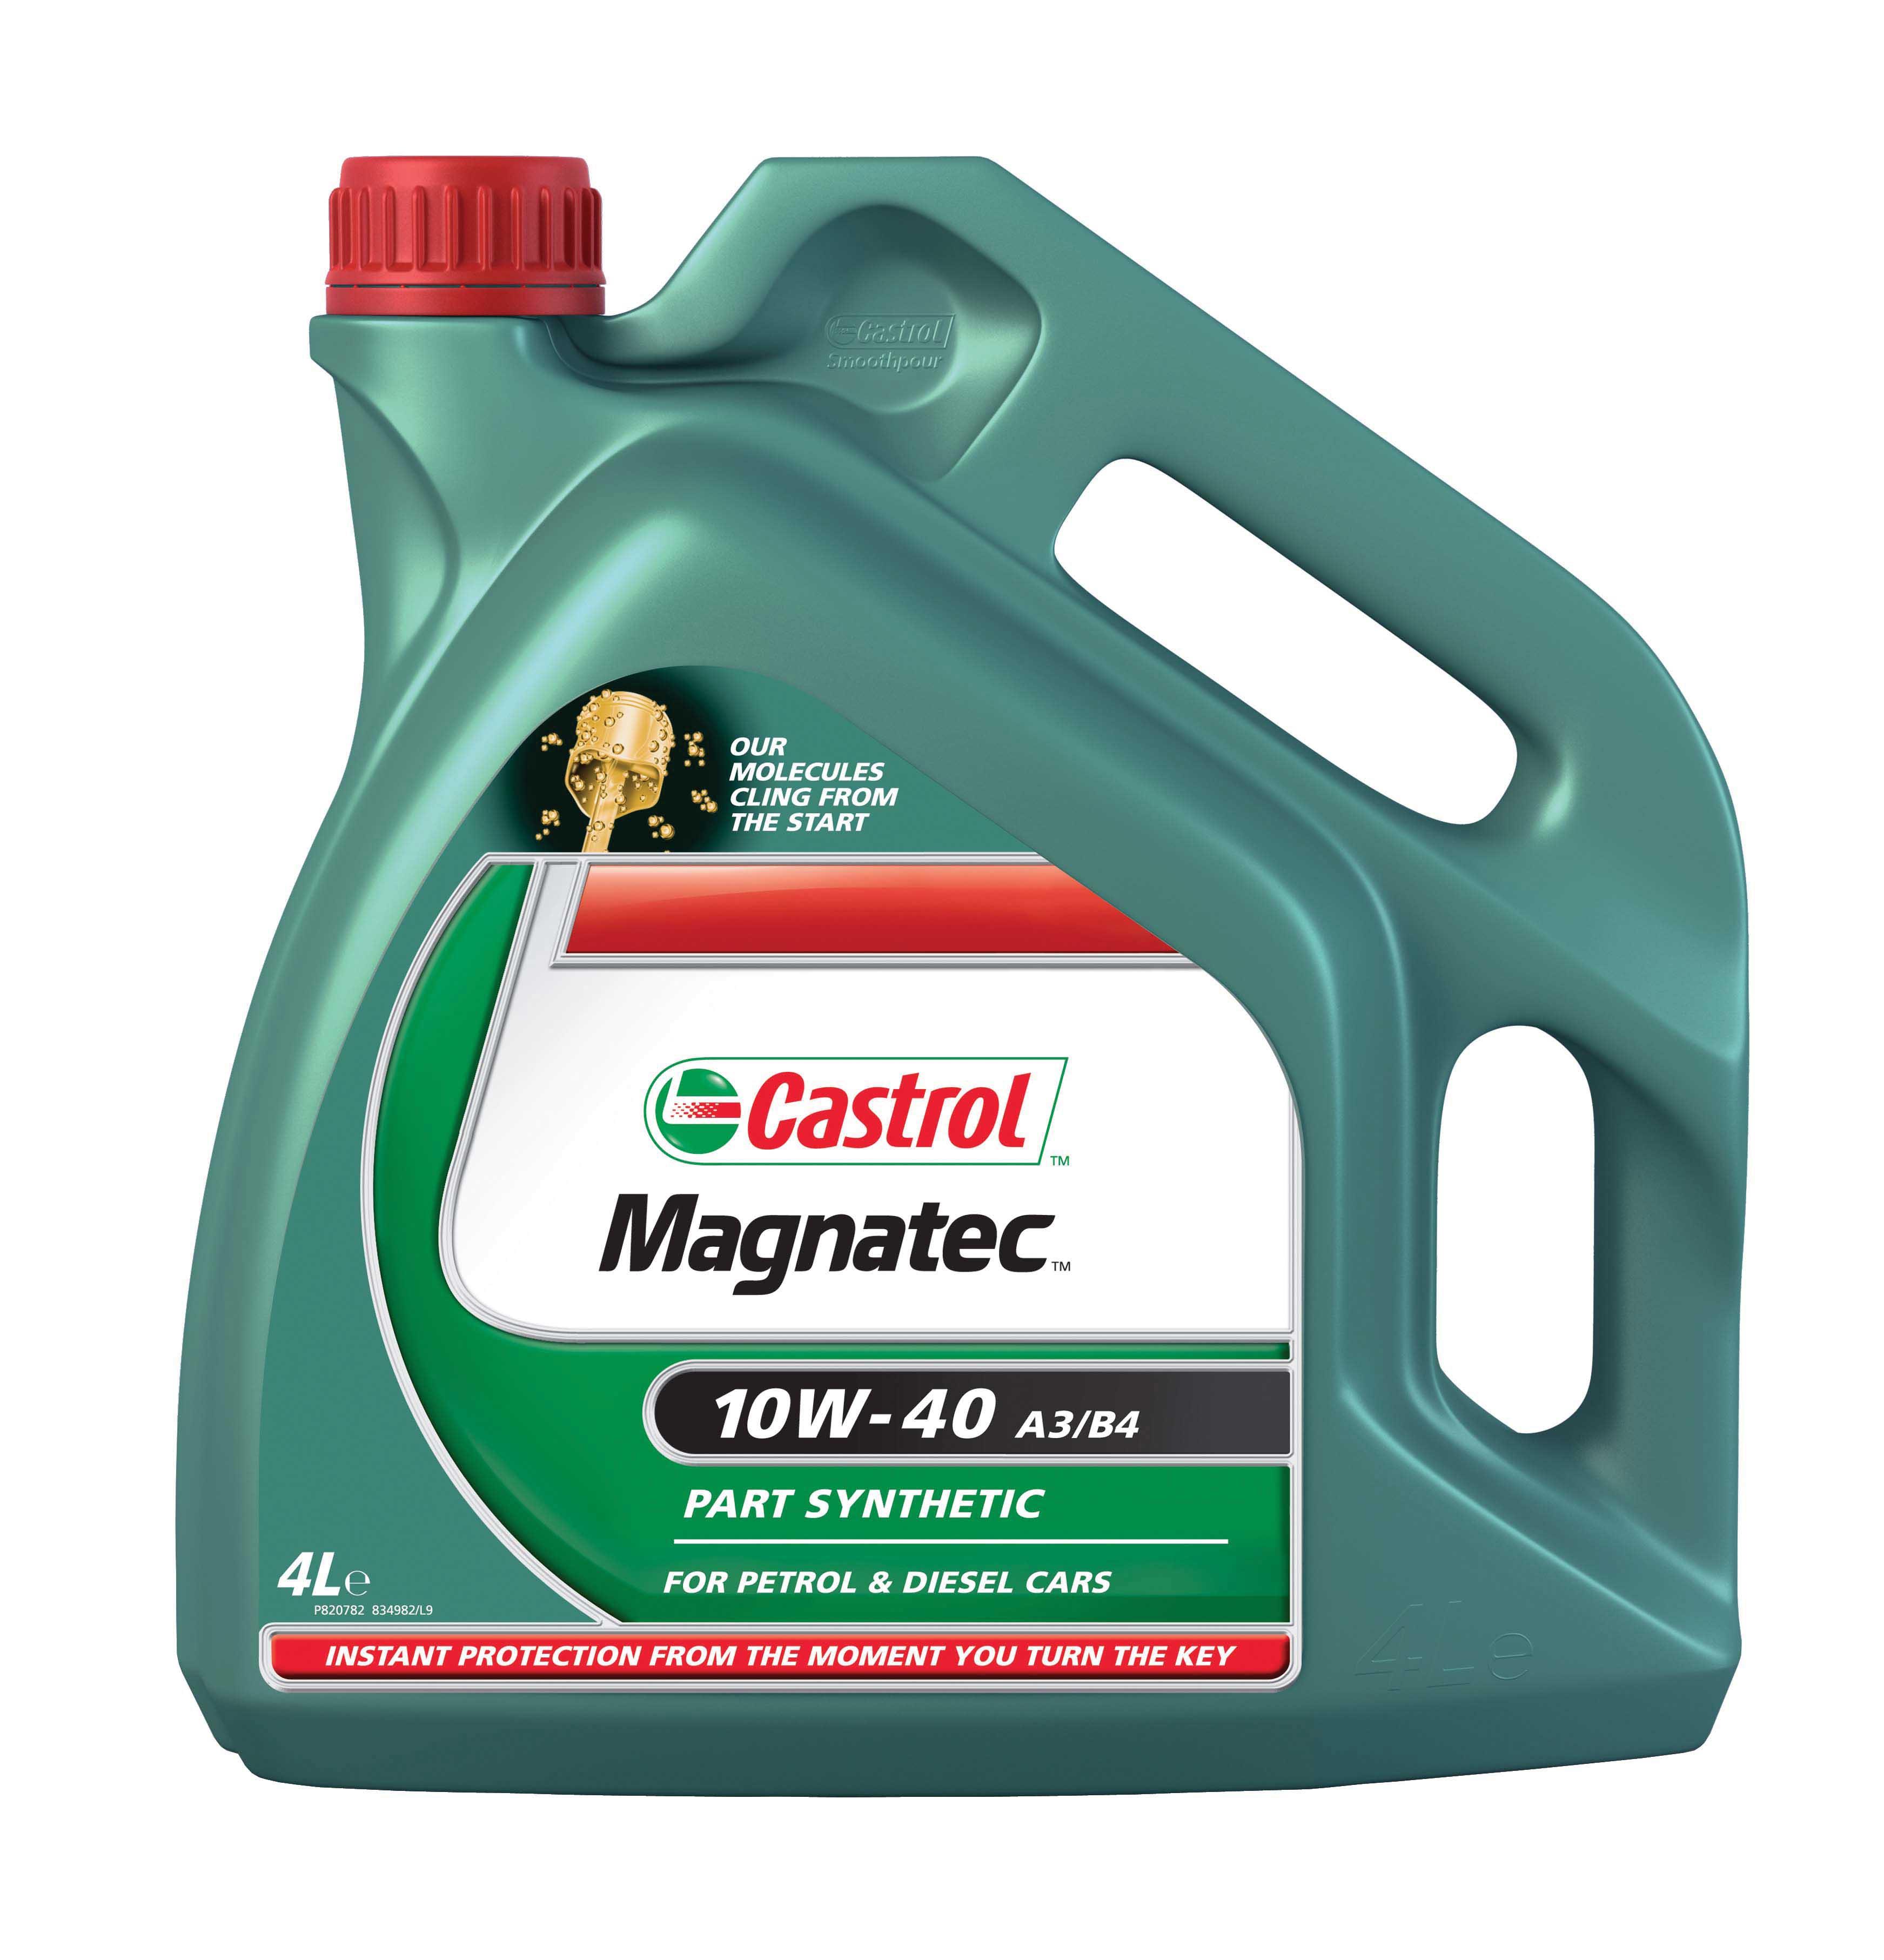 2266 7065 castrol magnatec 10w 40 a3 b4 4litre engine oil. Black Bedroom Furniture Sets. Home Design Ideas